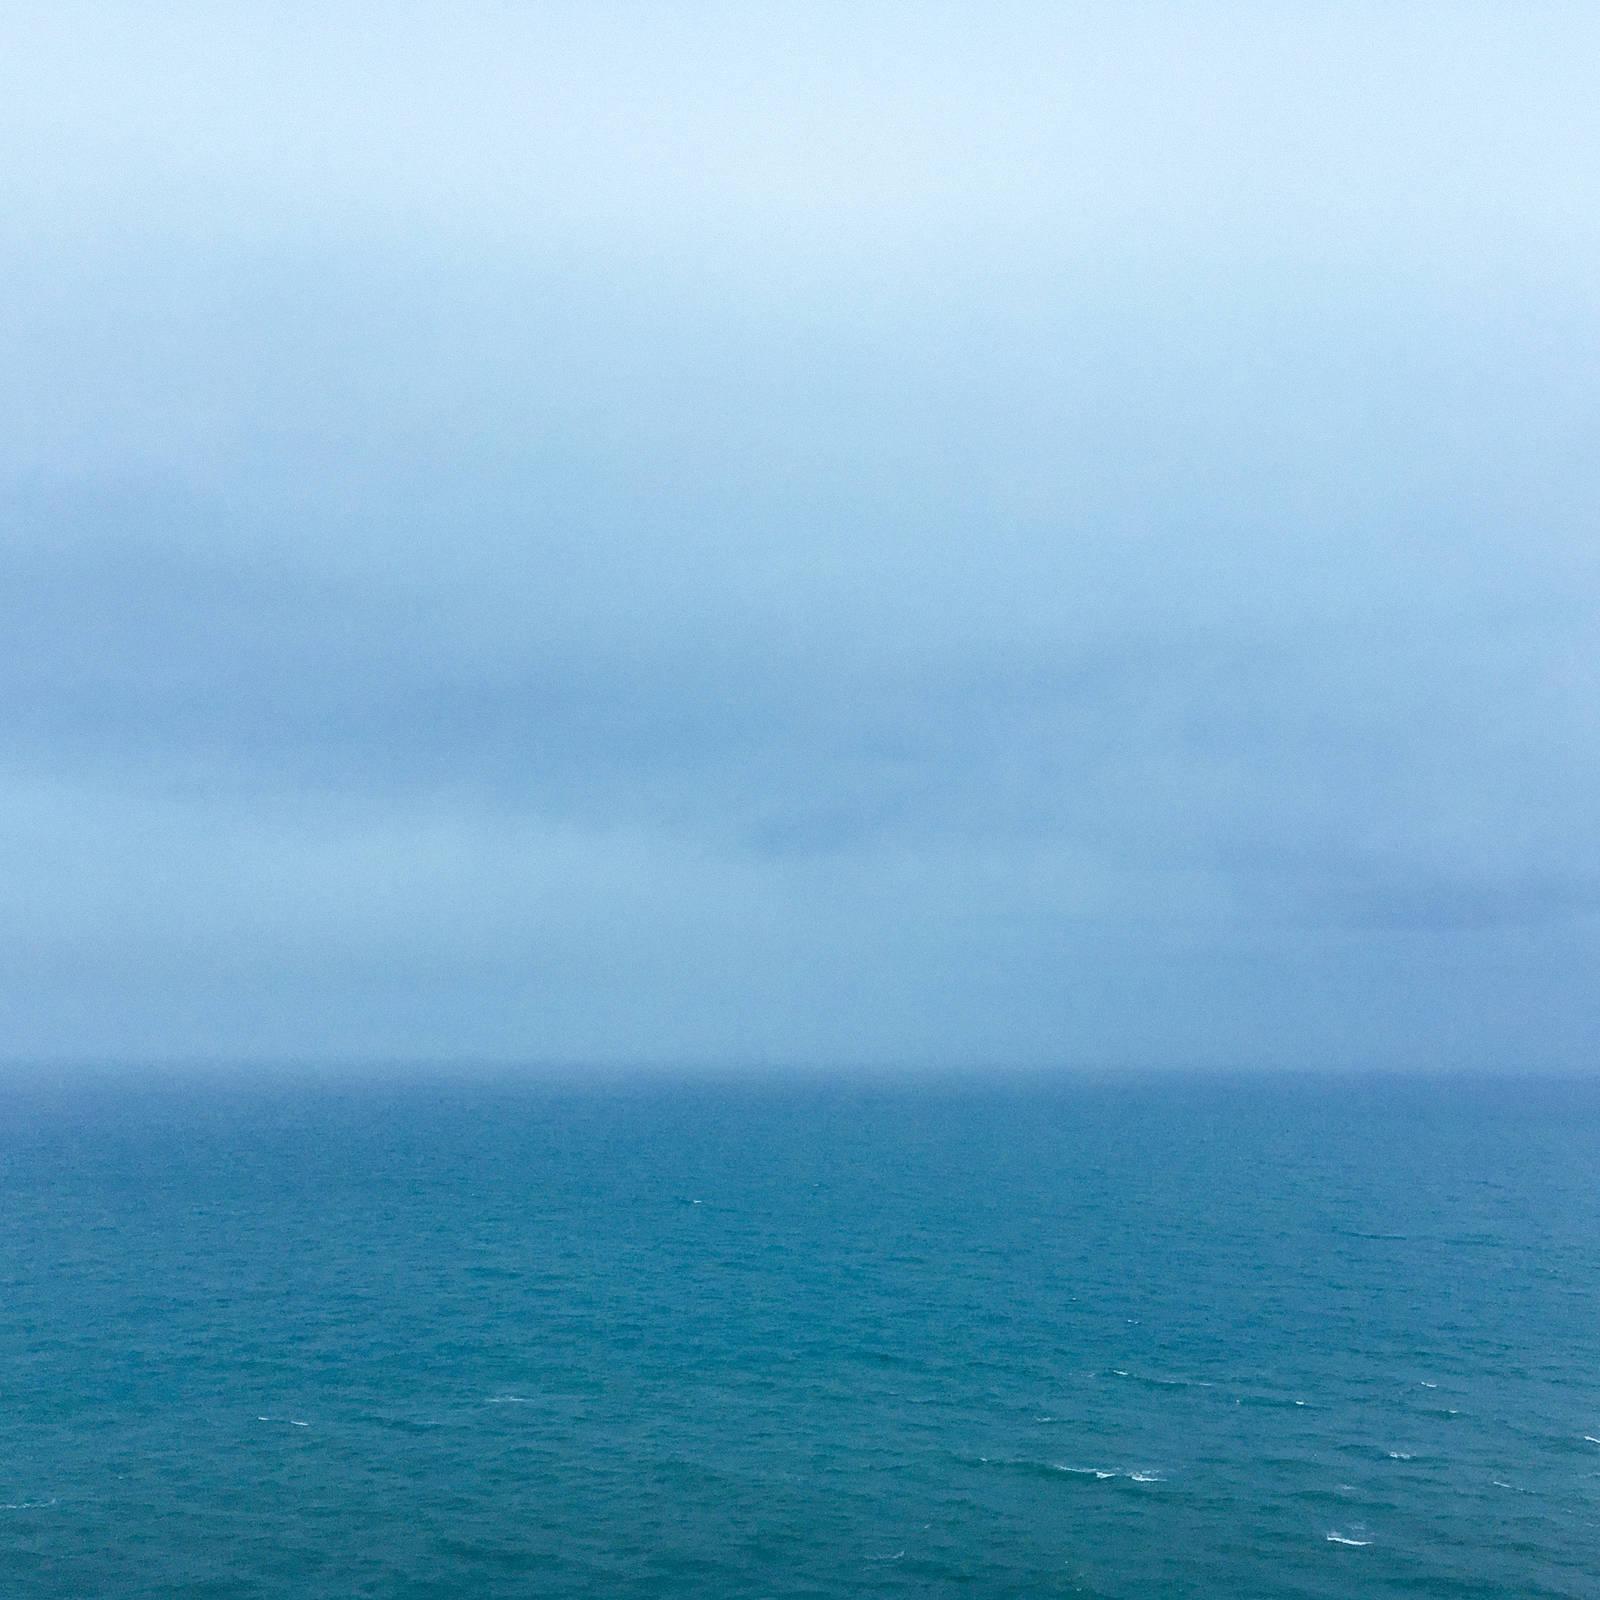 The Irish Sea